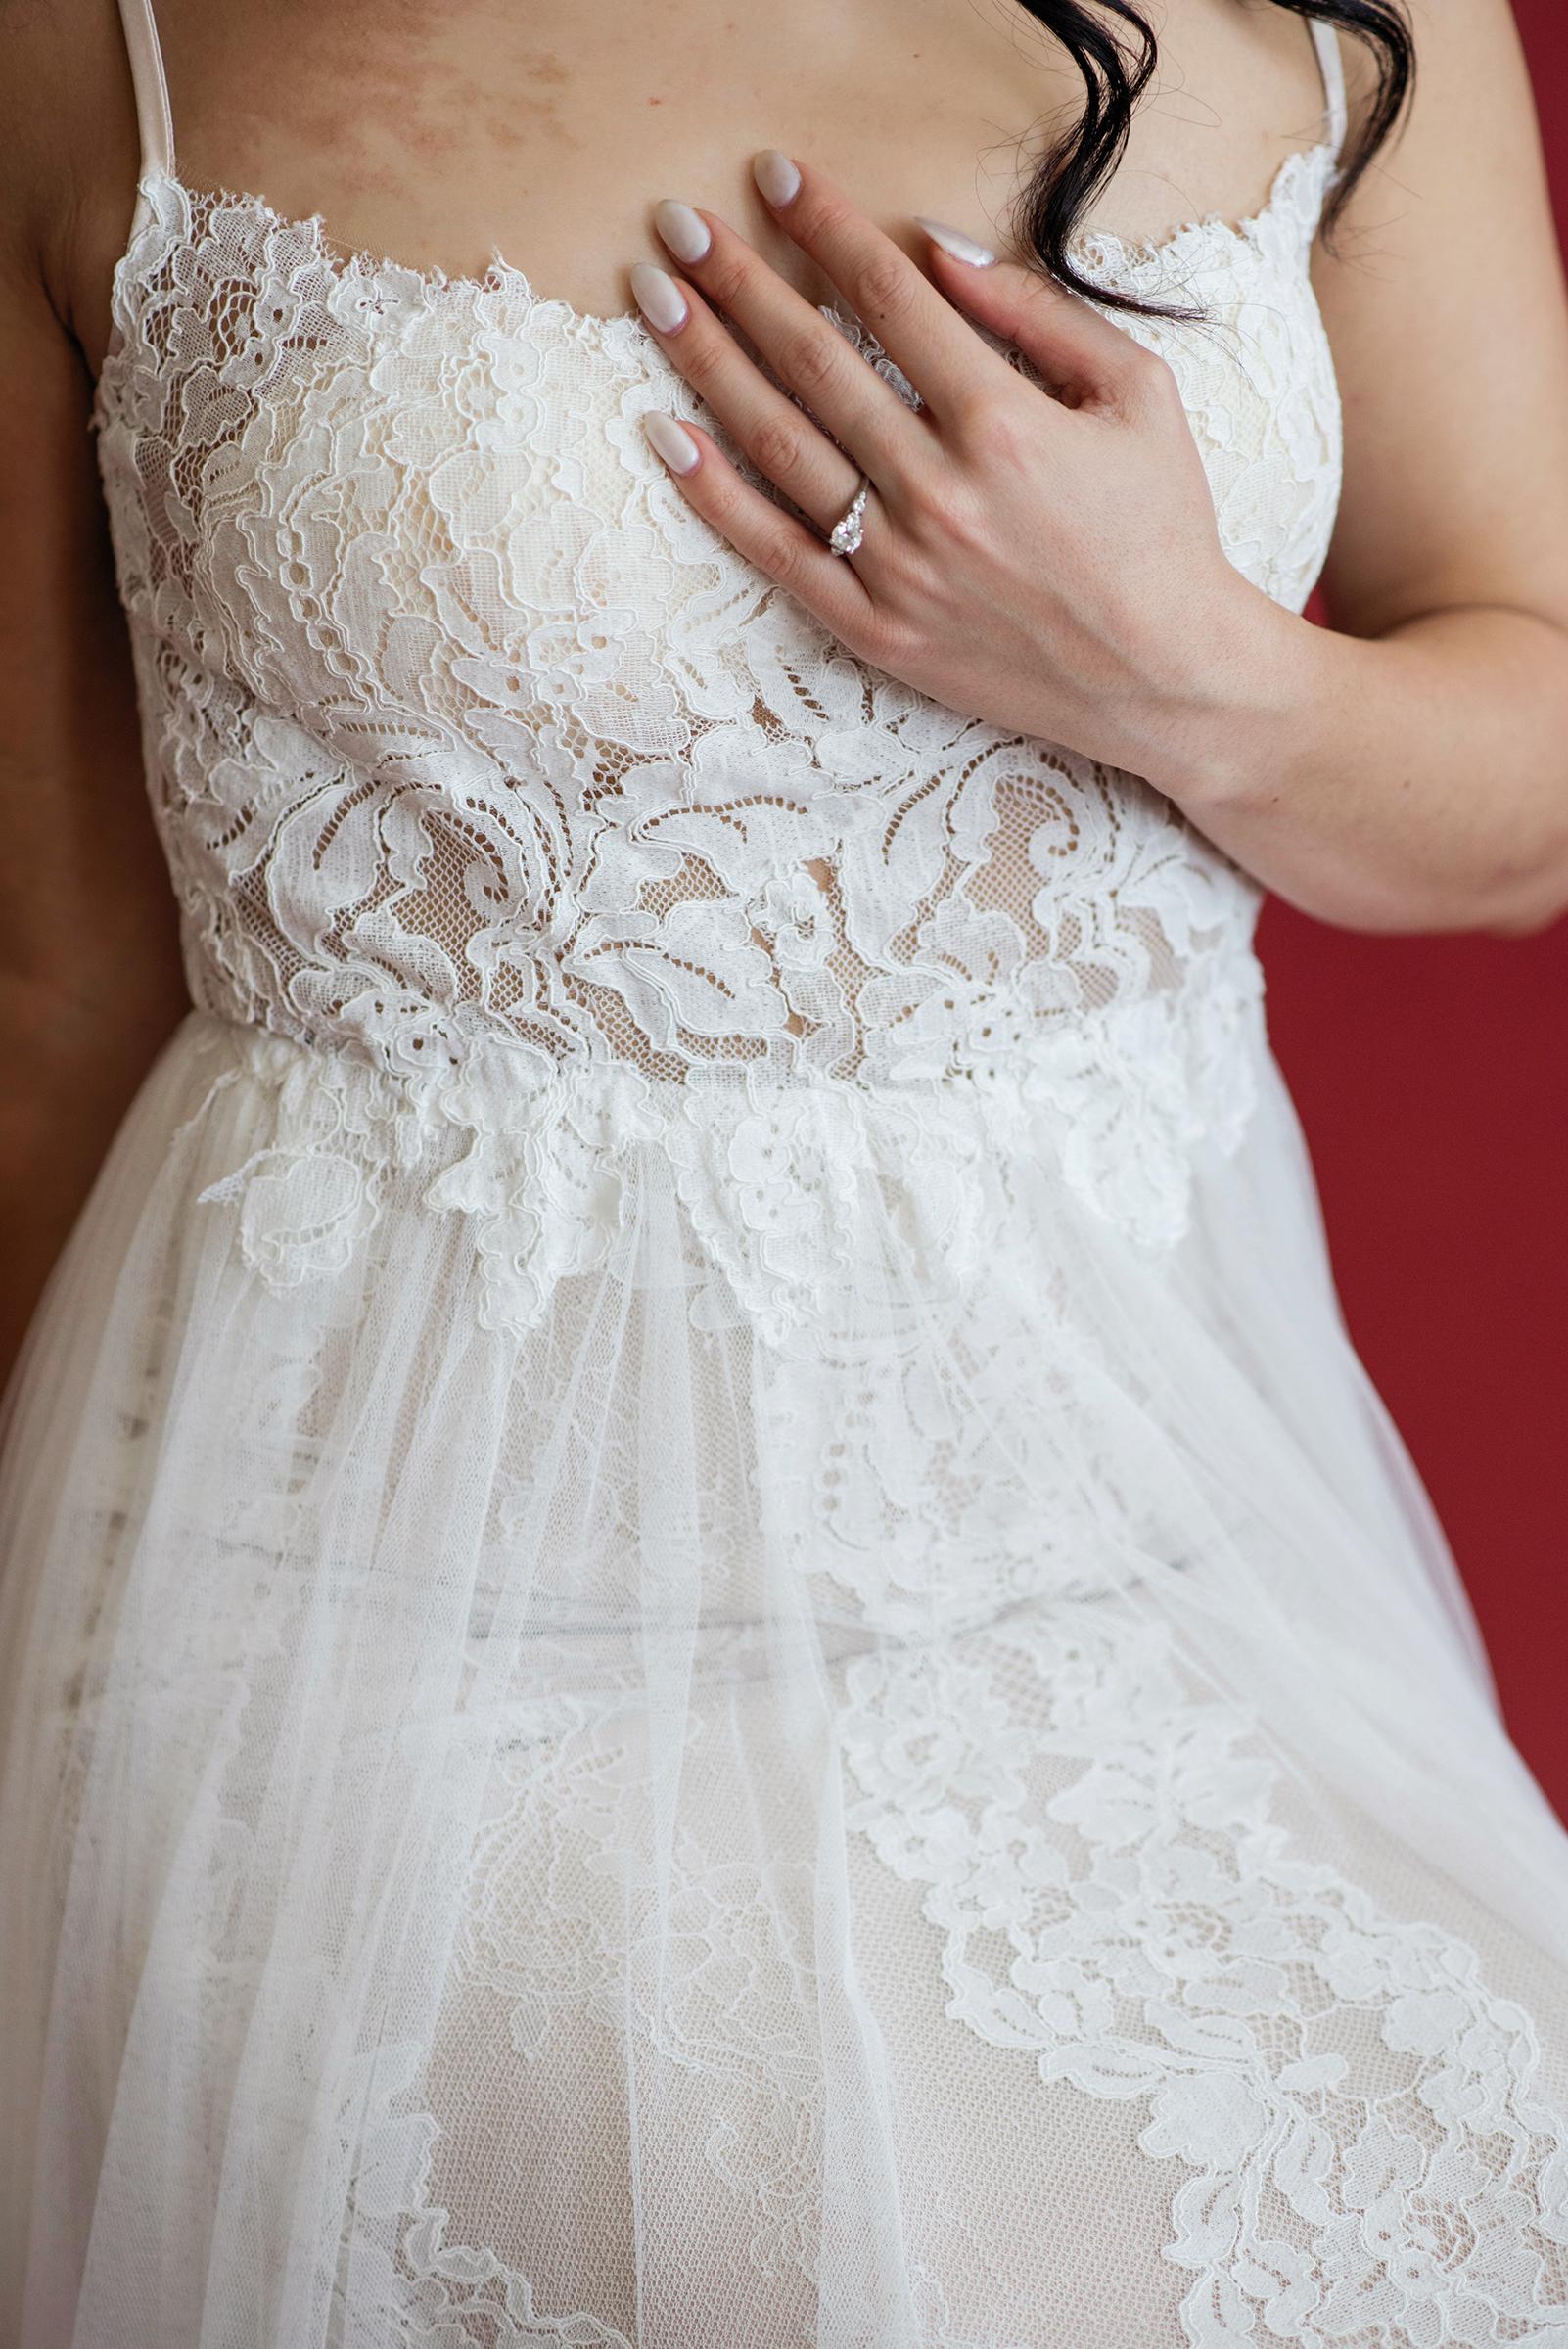 Stephanie-First Dress Details-10.jpg